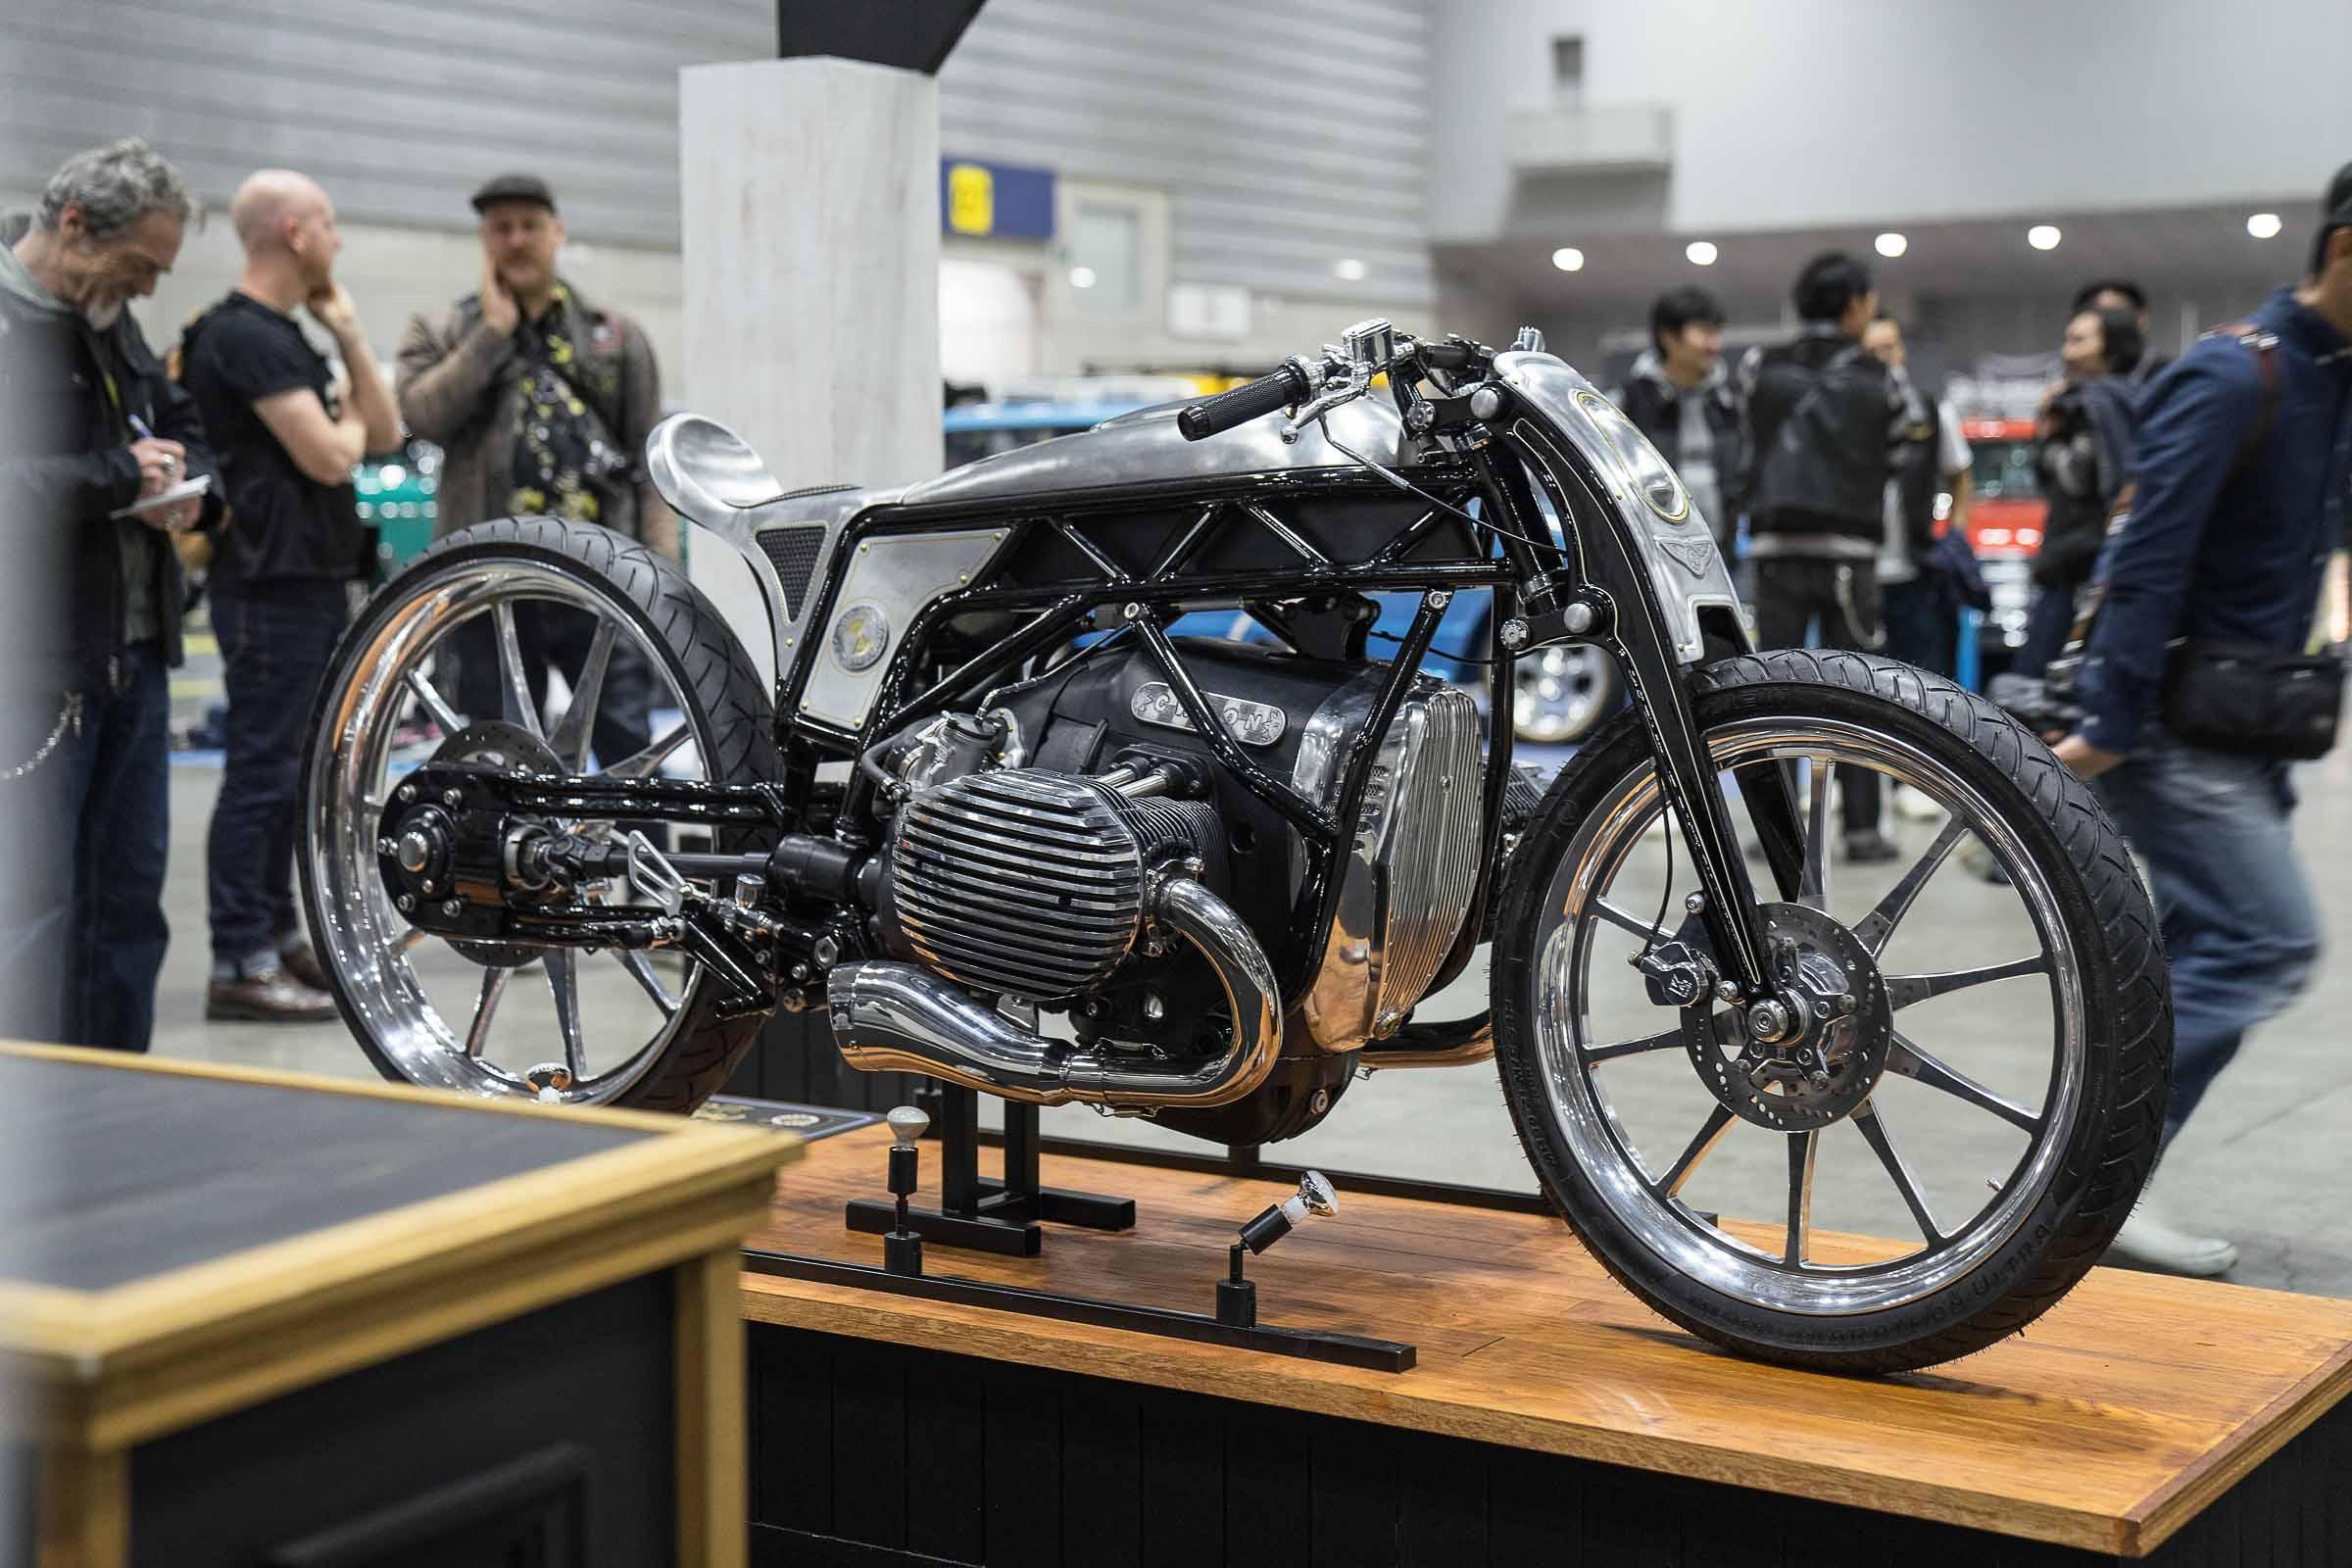 Bmw 1800 motorrad